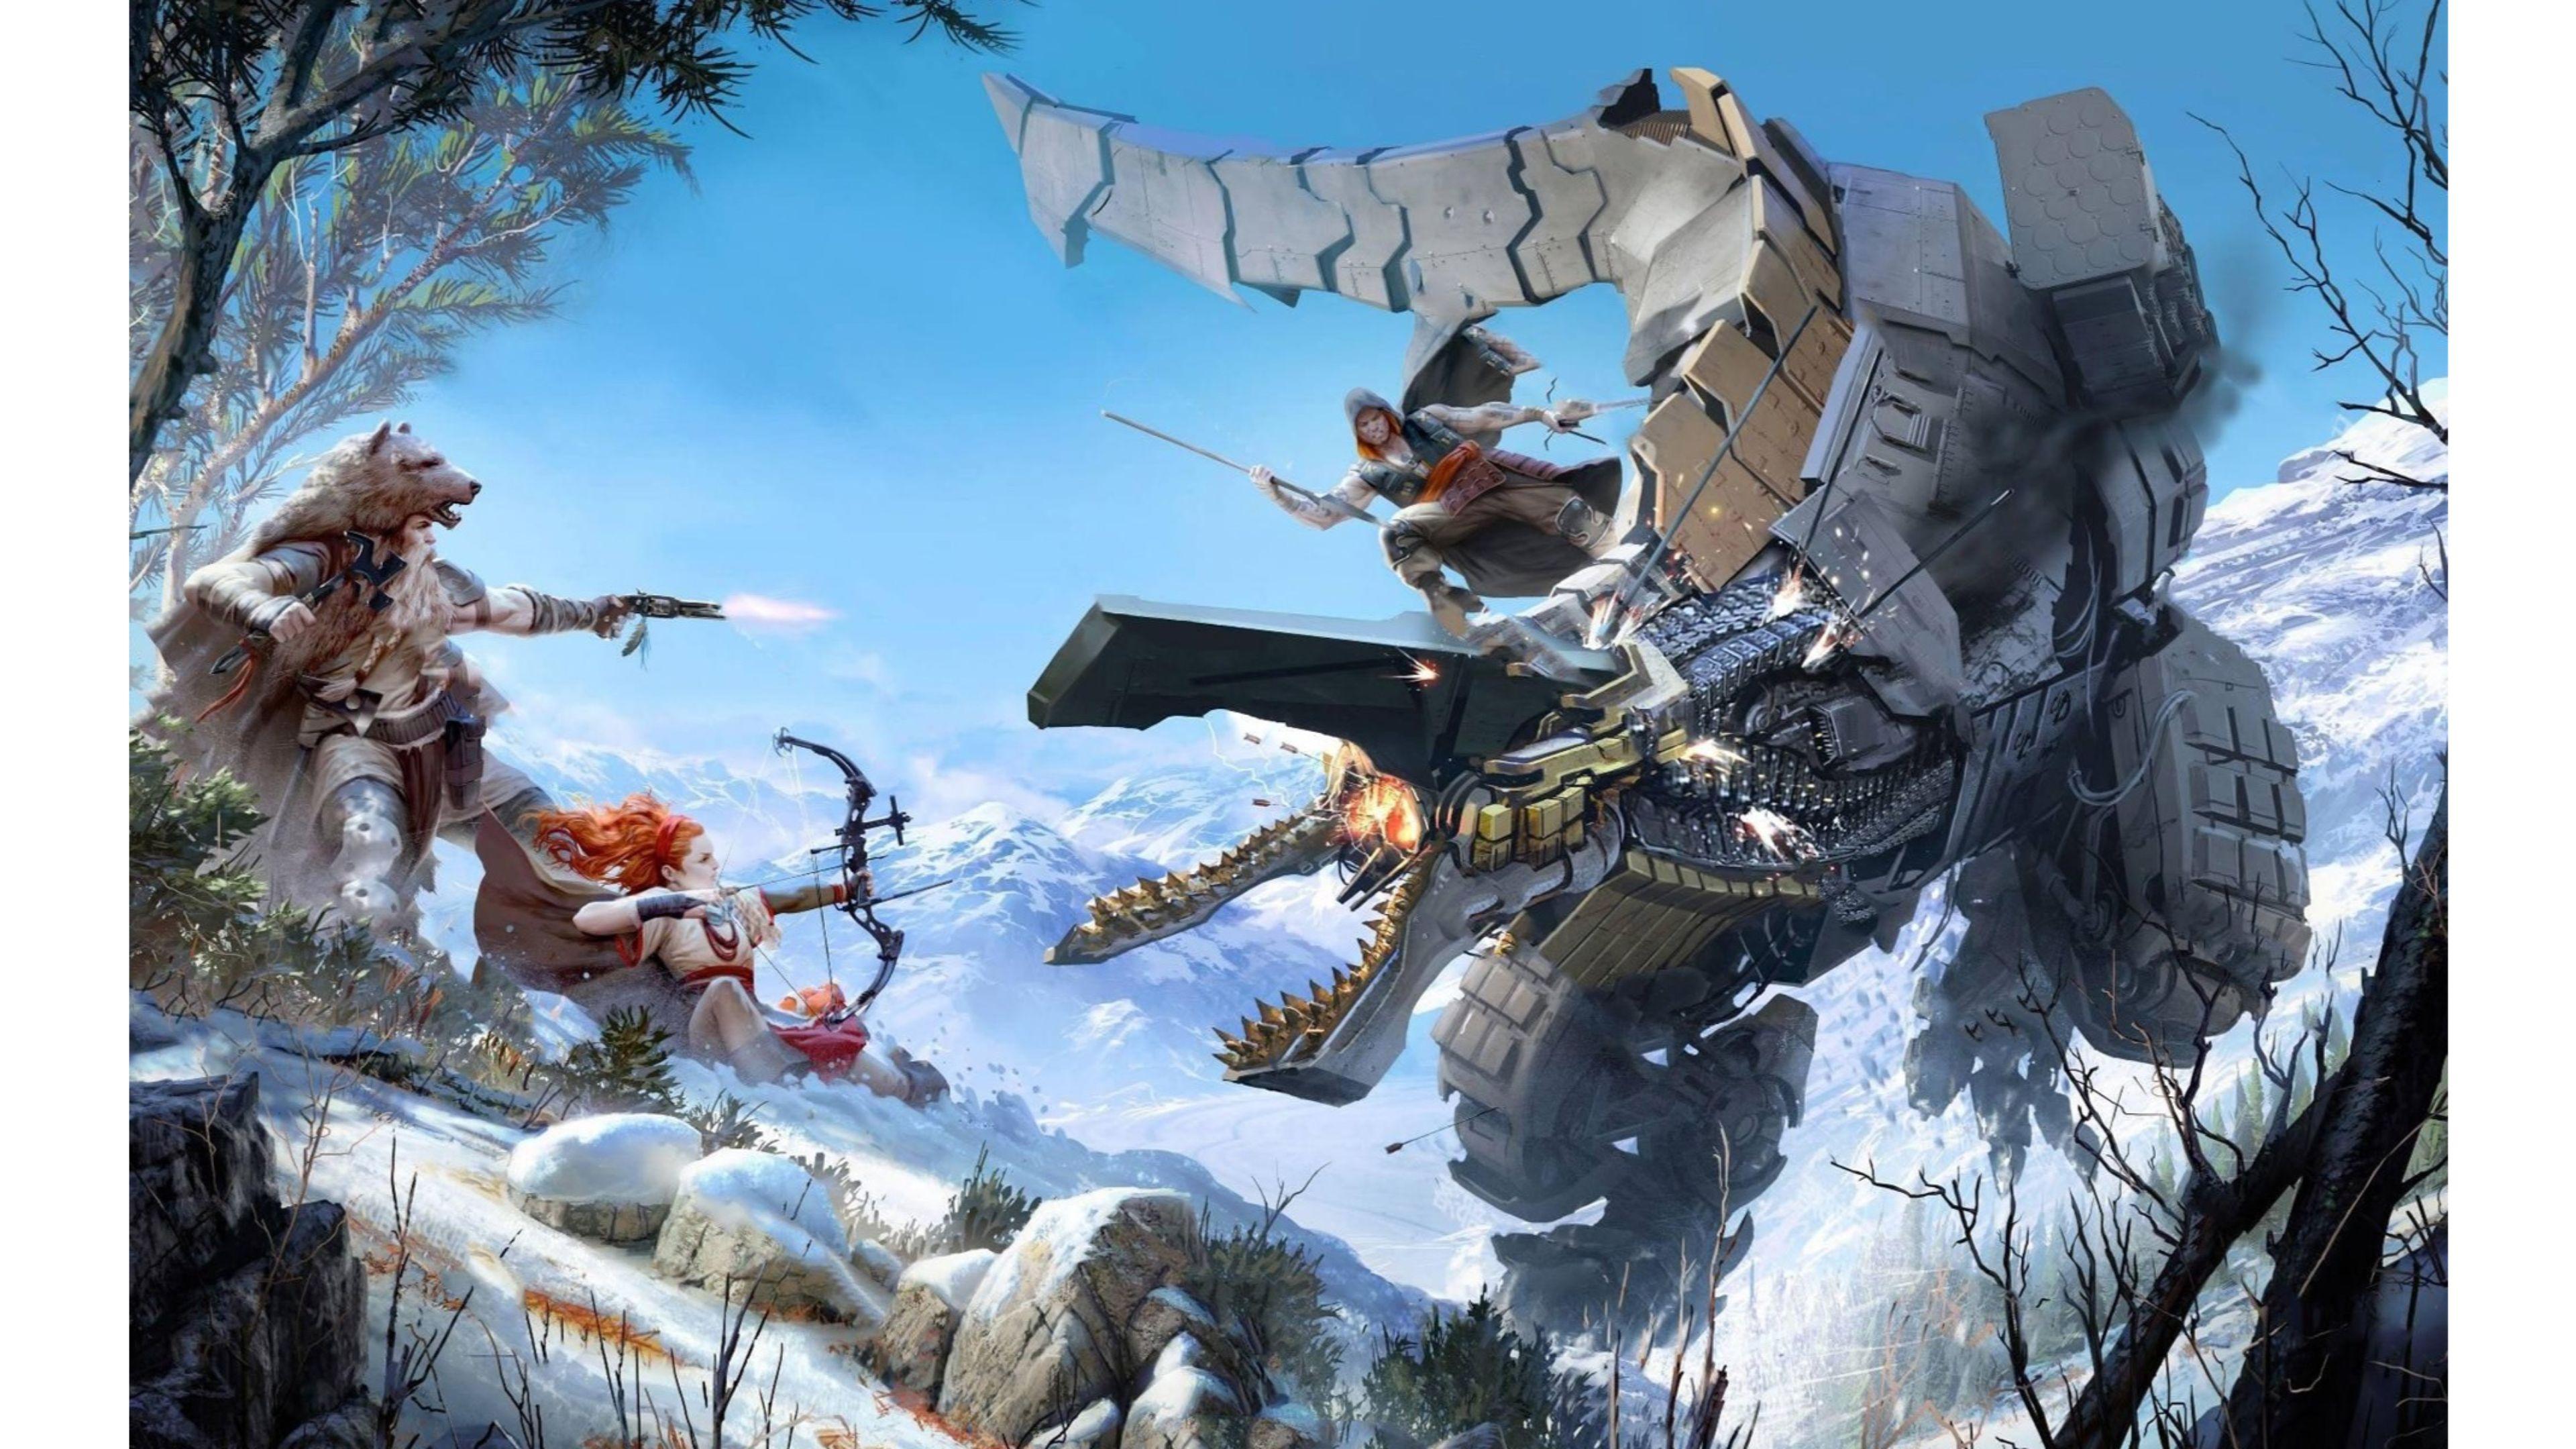 E3 Announcement 2016 Horizon Zero Dawn 4k Wallpapers - All Robots Horizon Zero Dawn , HD Wallpaper & Backgrounds